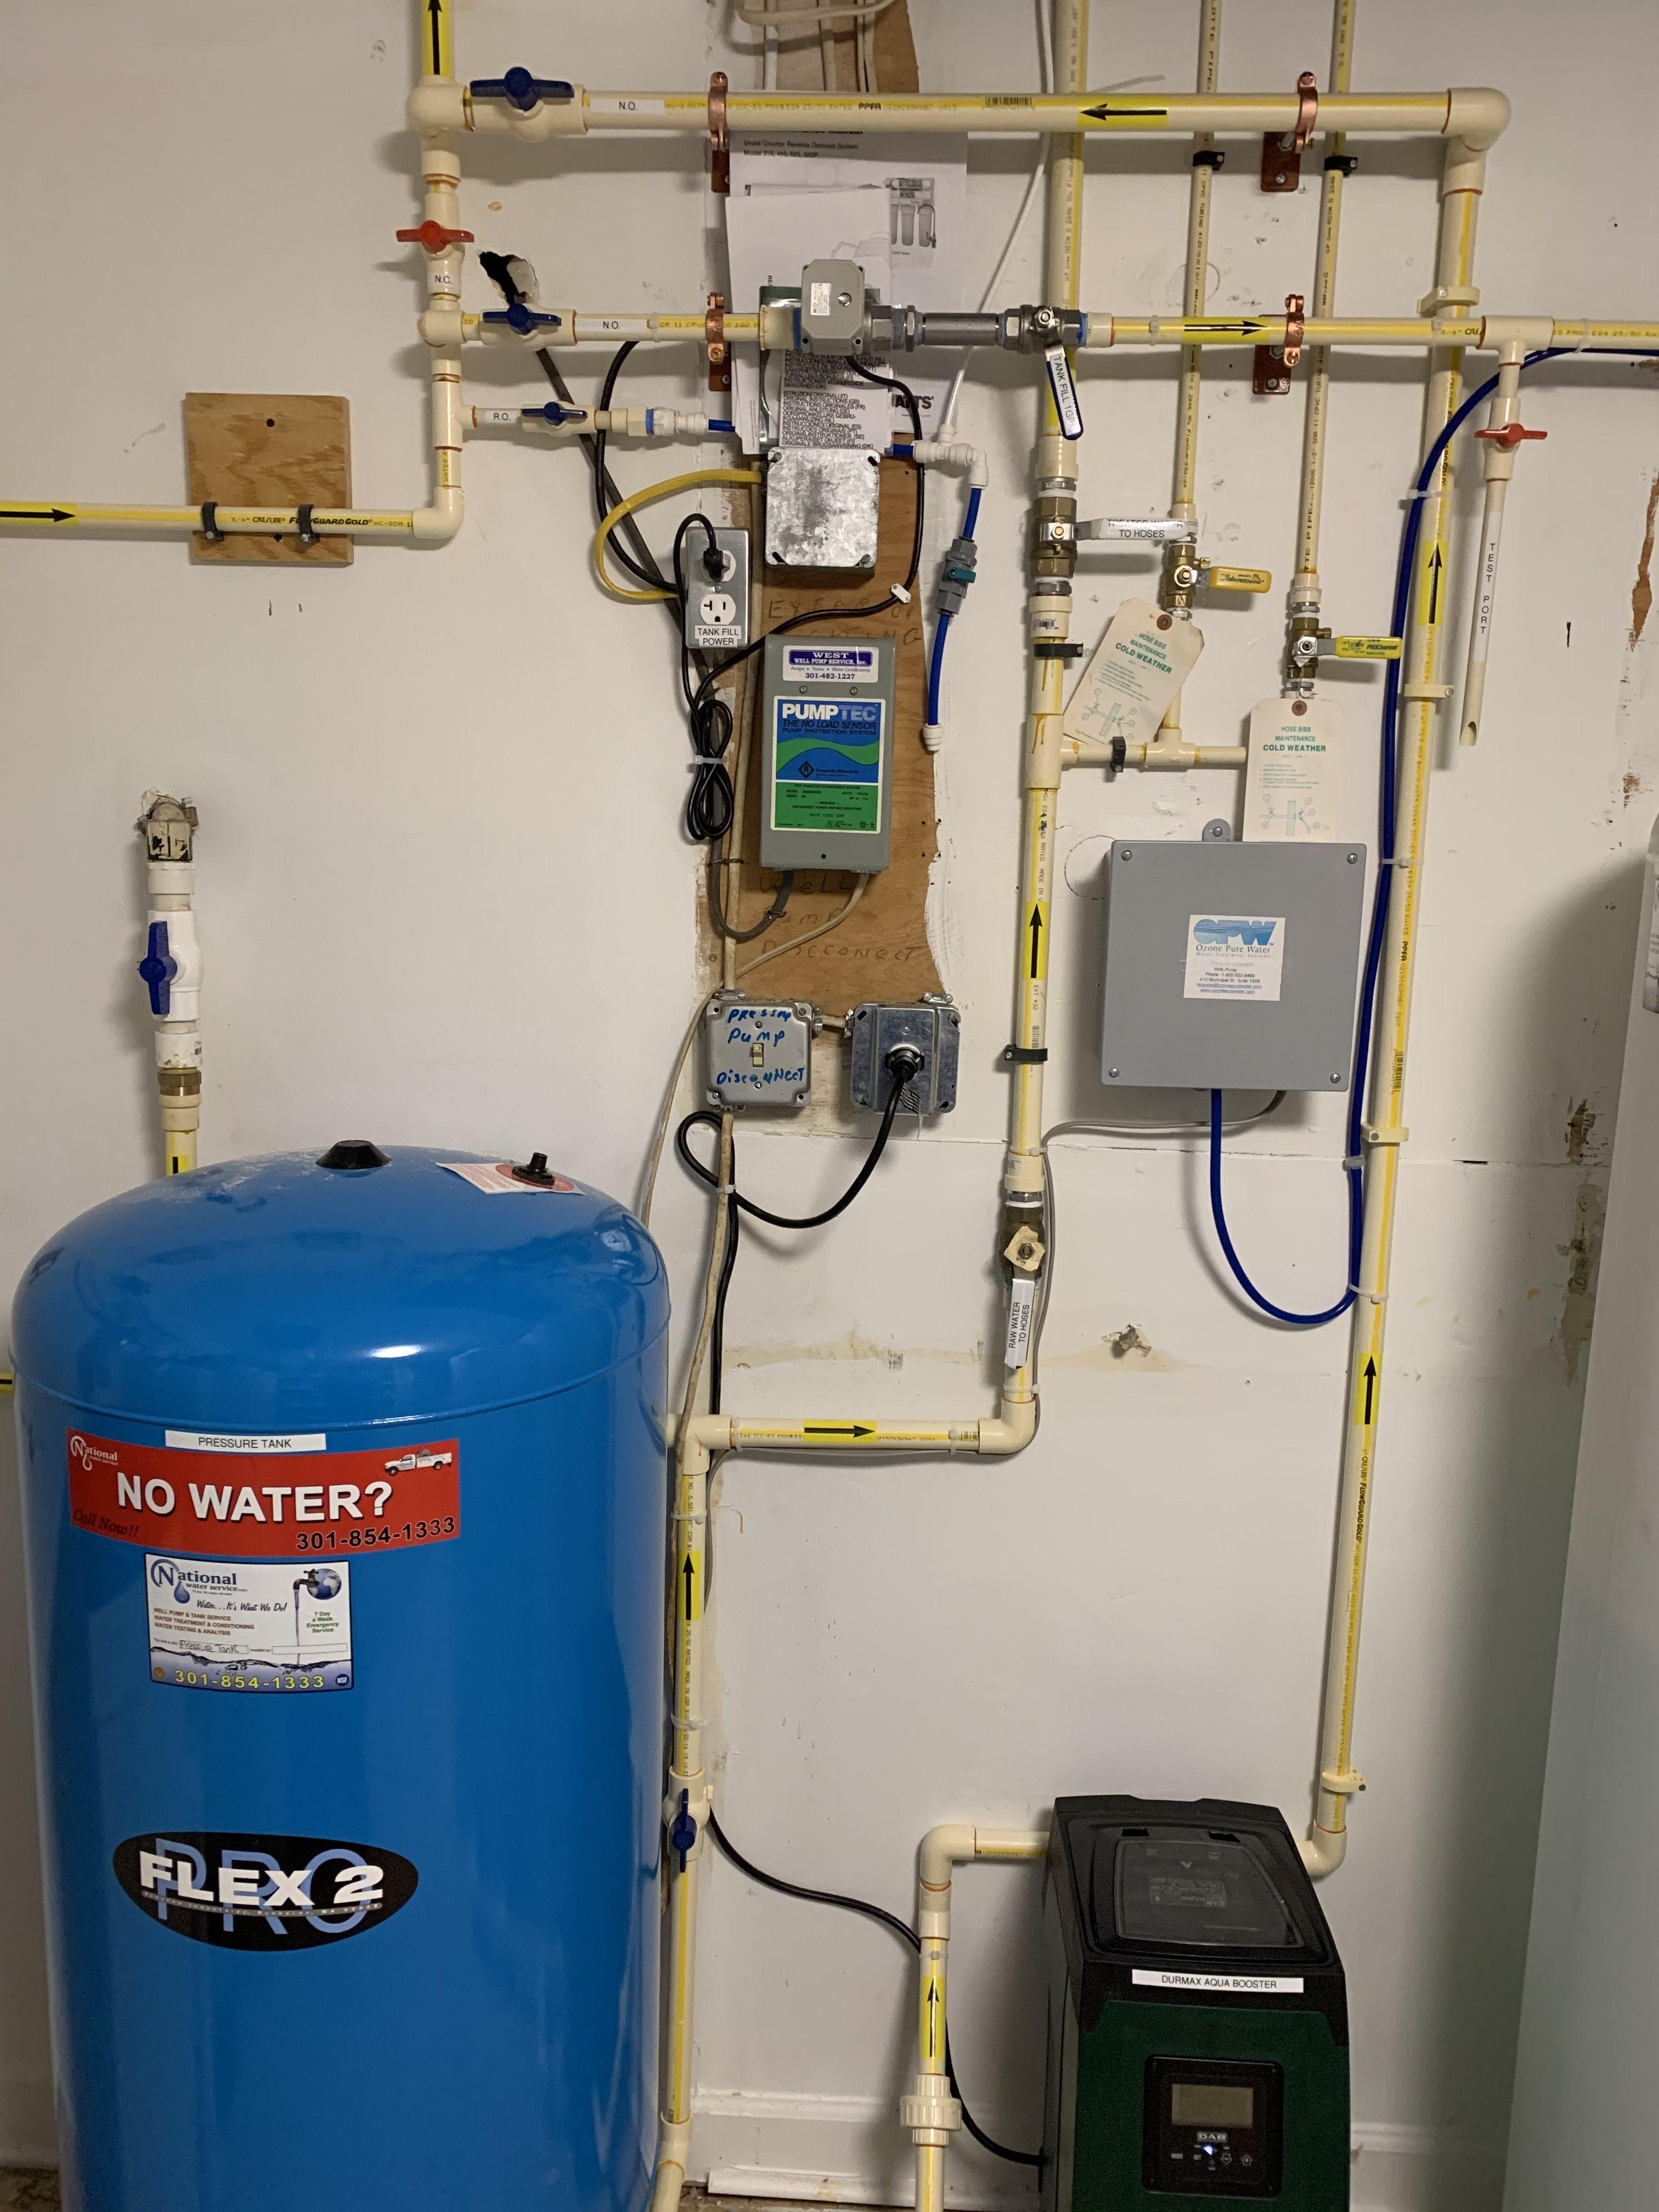 Pressure Tank Pressure Booster For Water Storage Tank Water Storage Tanks Water Treatment Storage Tank